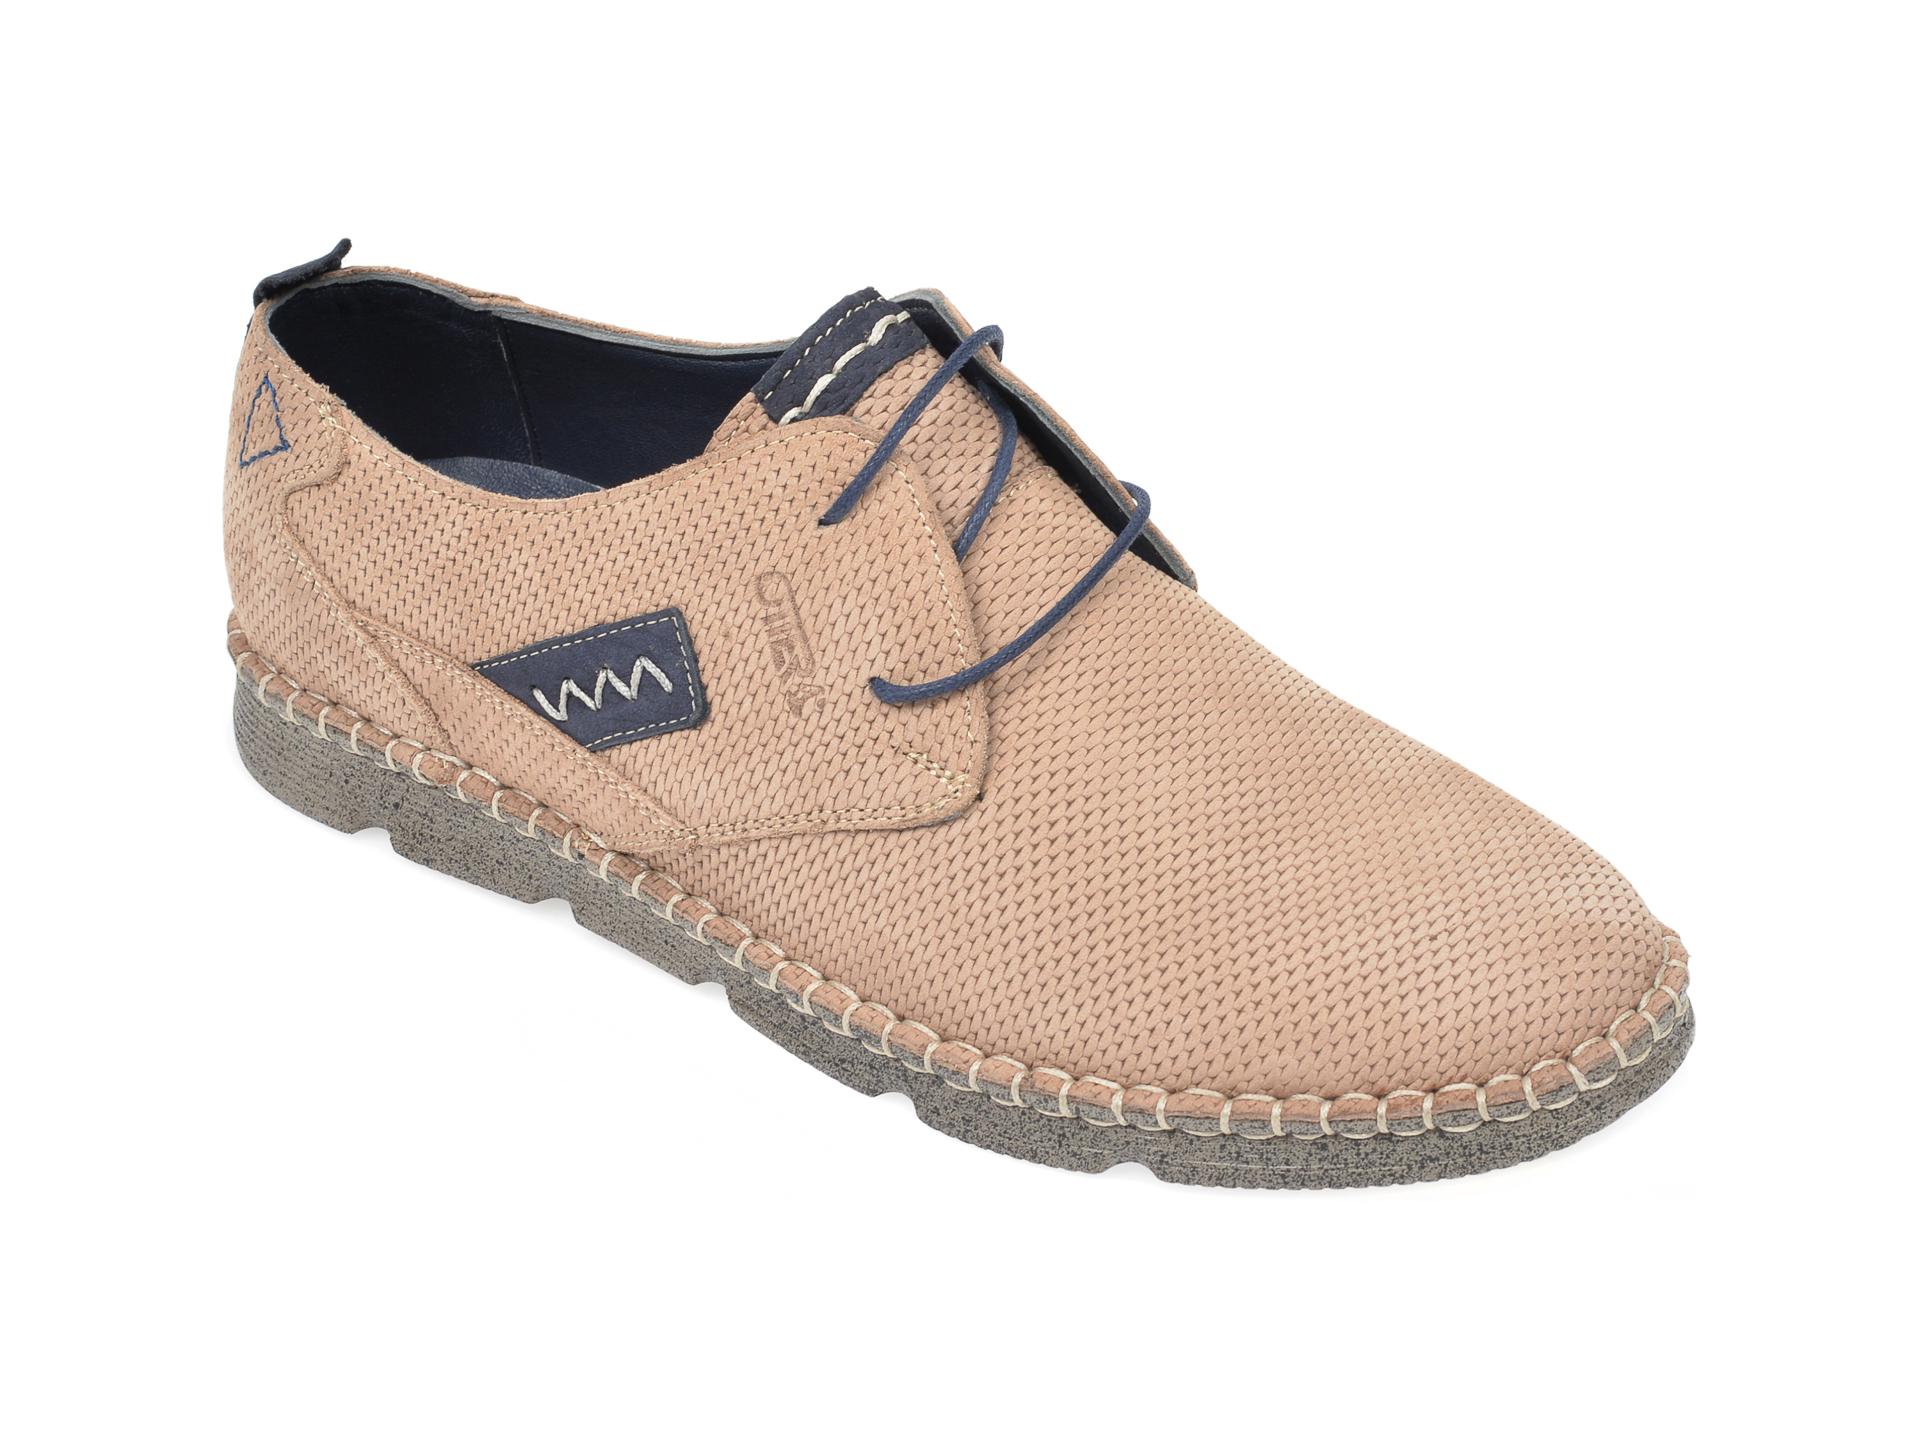 Pantofi OTTER maro, 2818, din nabuc imagine